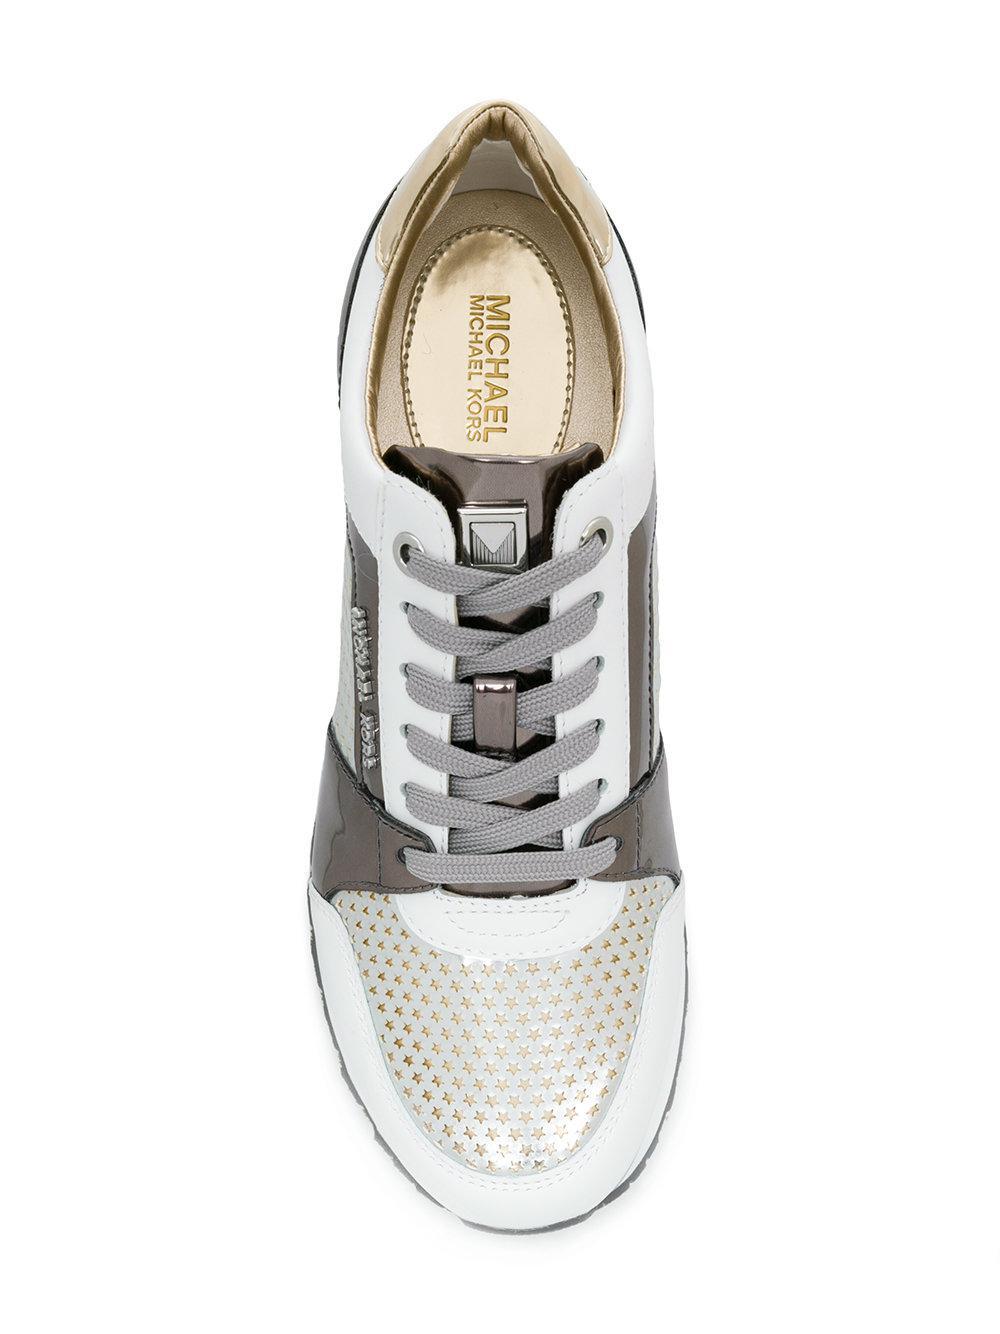 MICHAEL Michael Kors Cotton Billie Sneakers in White